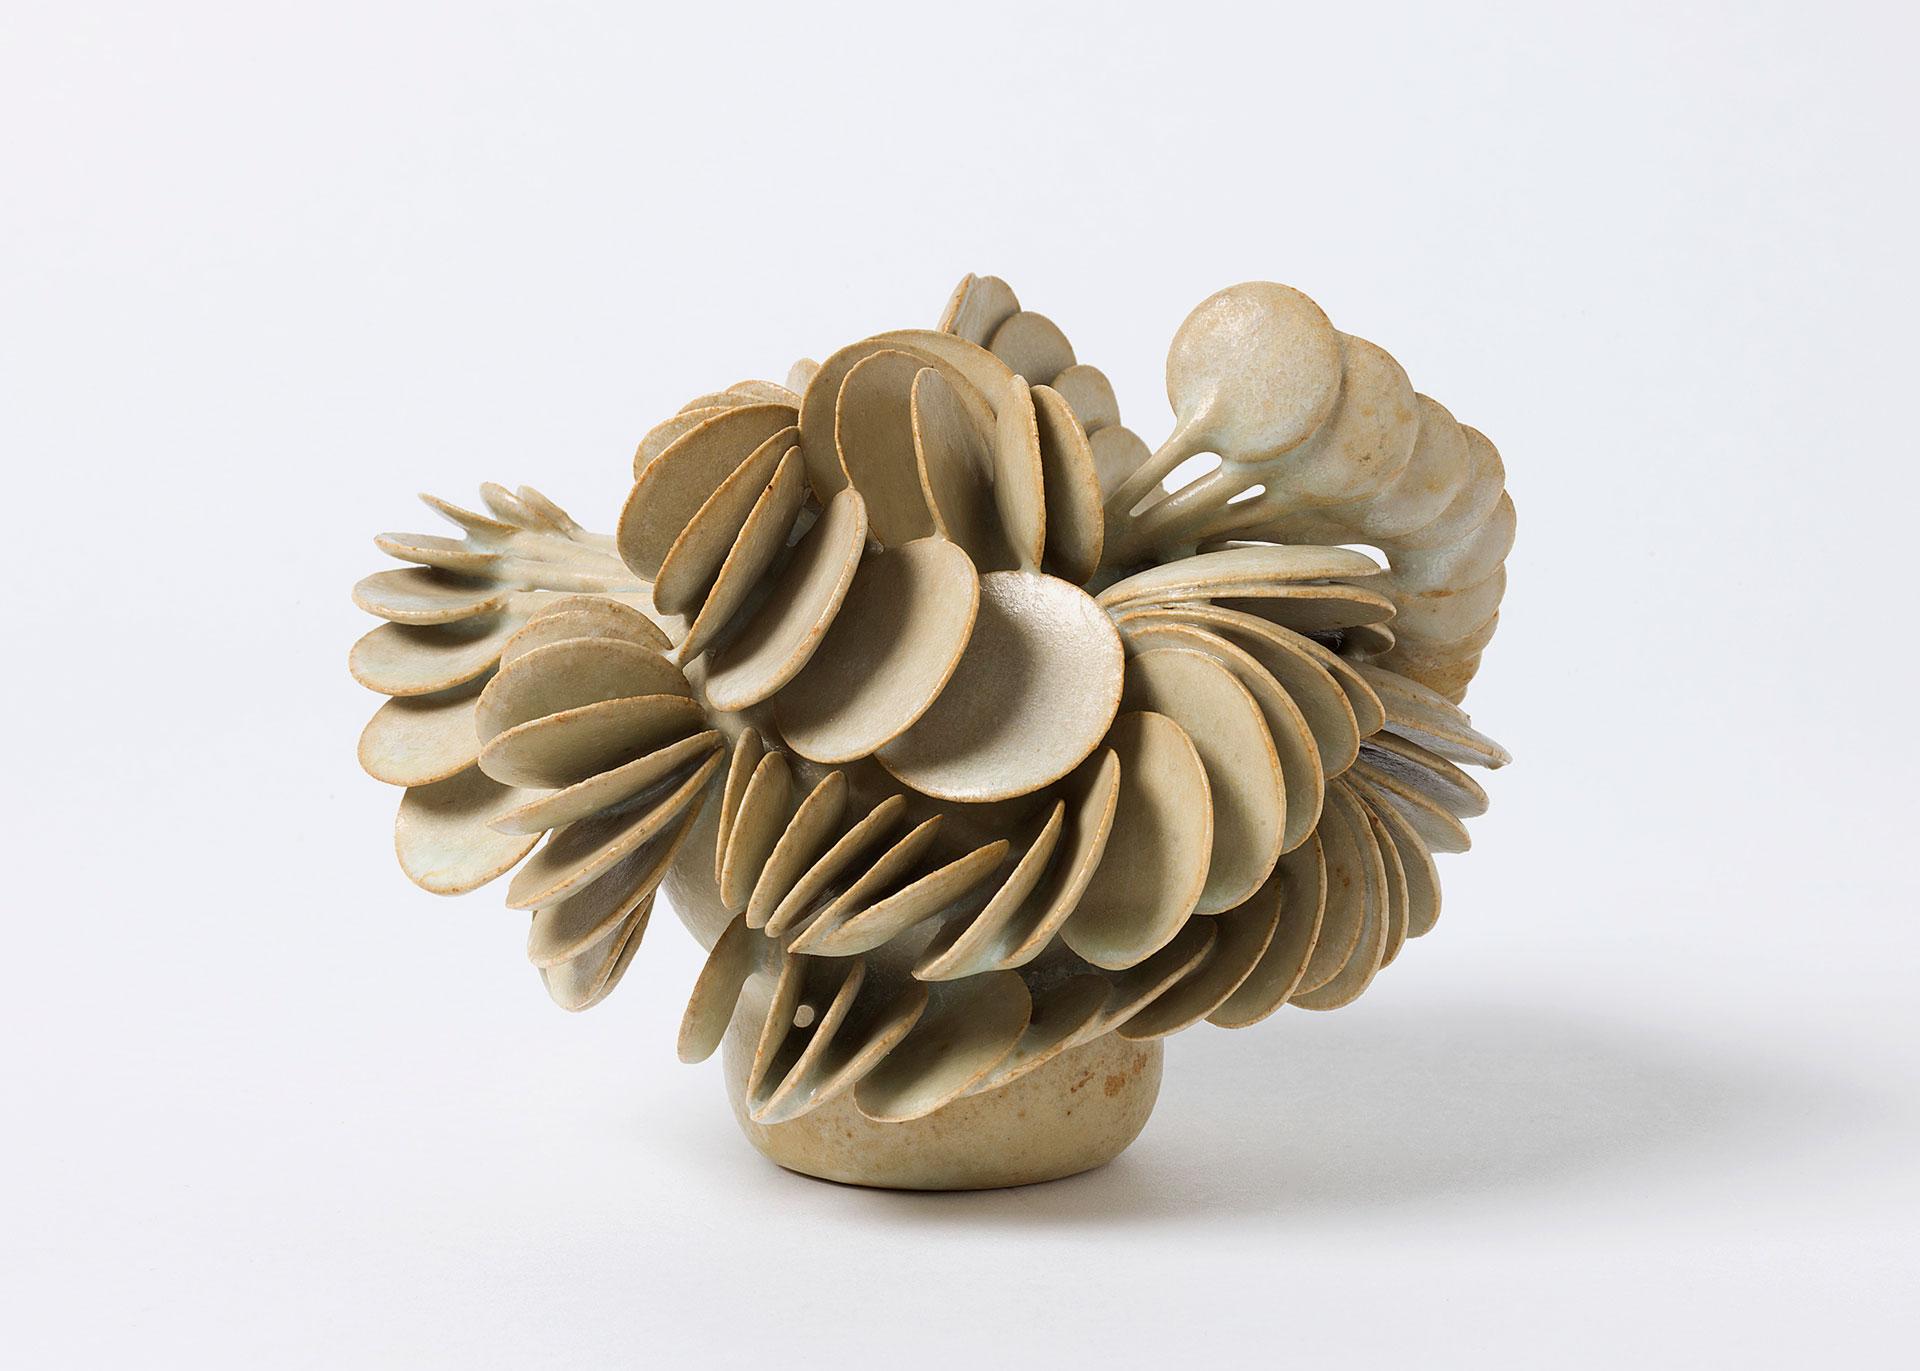 Beate Kuhn, Löffelobjekt, Steinzeug, Keramik